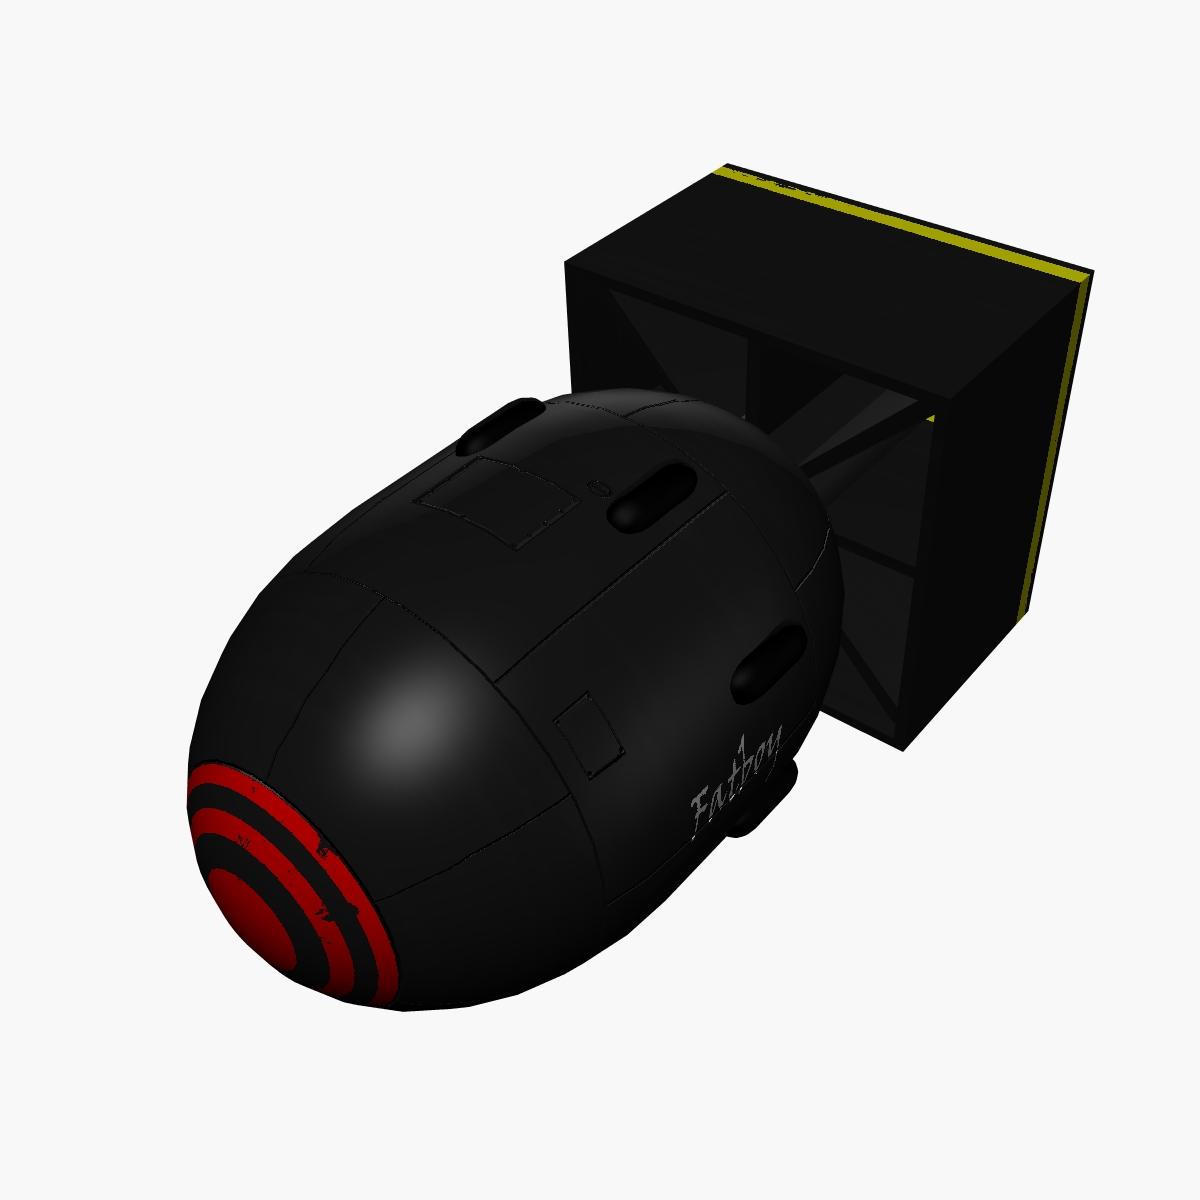 bomb with fatboy scheme 3d model 3ds dxf fbx blend cob dae x obj 162692